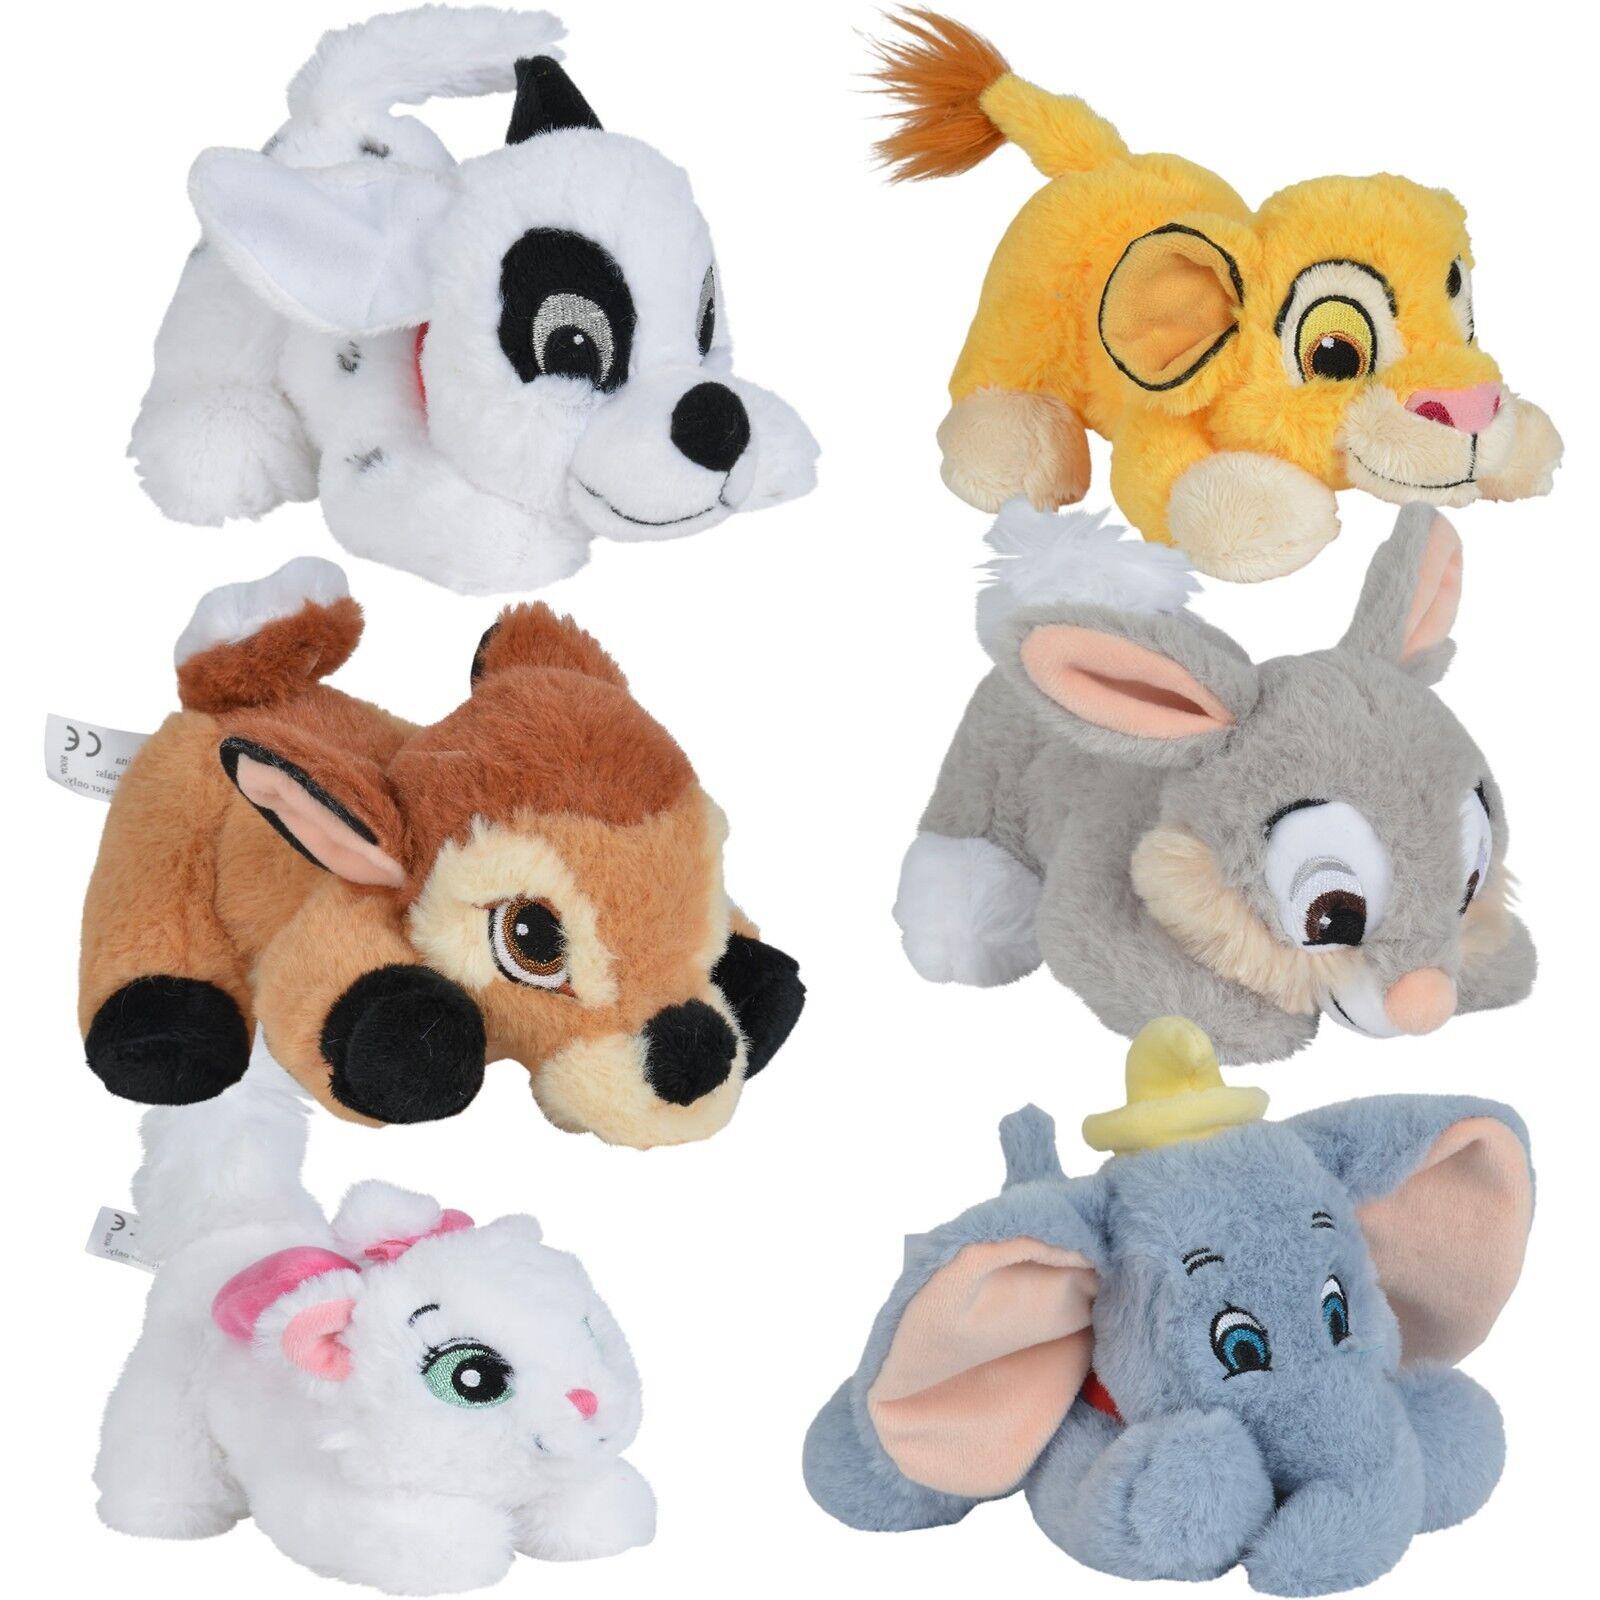 Disney Plüschfigur Kuscheltier Plüschtier Bambi Dalmatiner Dumbo Simba Klassic